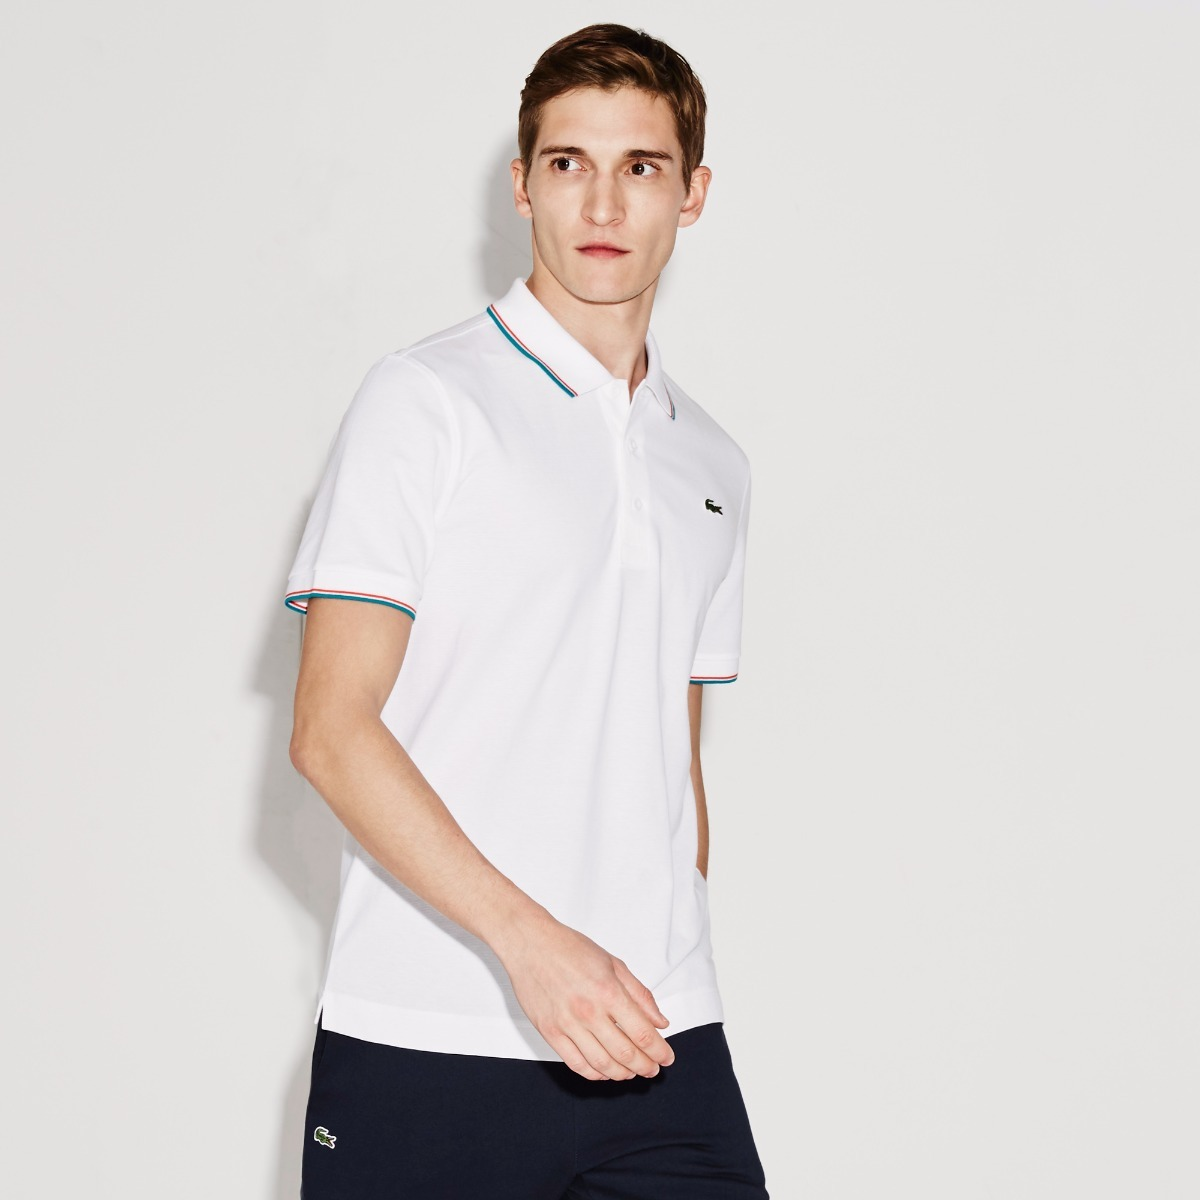 camisa polo lacoste sport tennis masculina malha ultraleve. Carregando zoom. 2e39909726